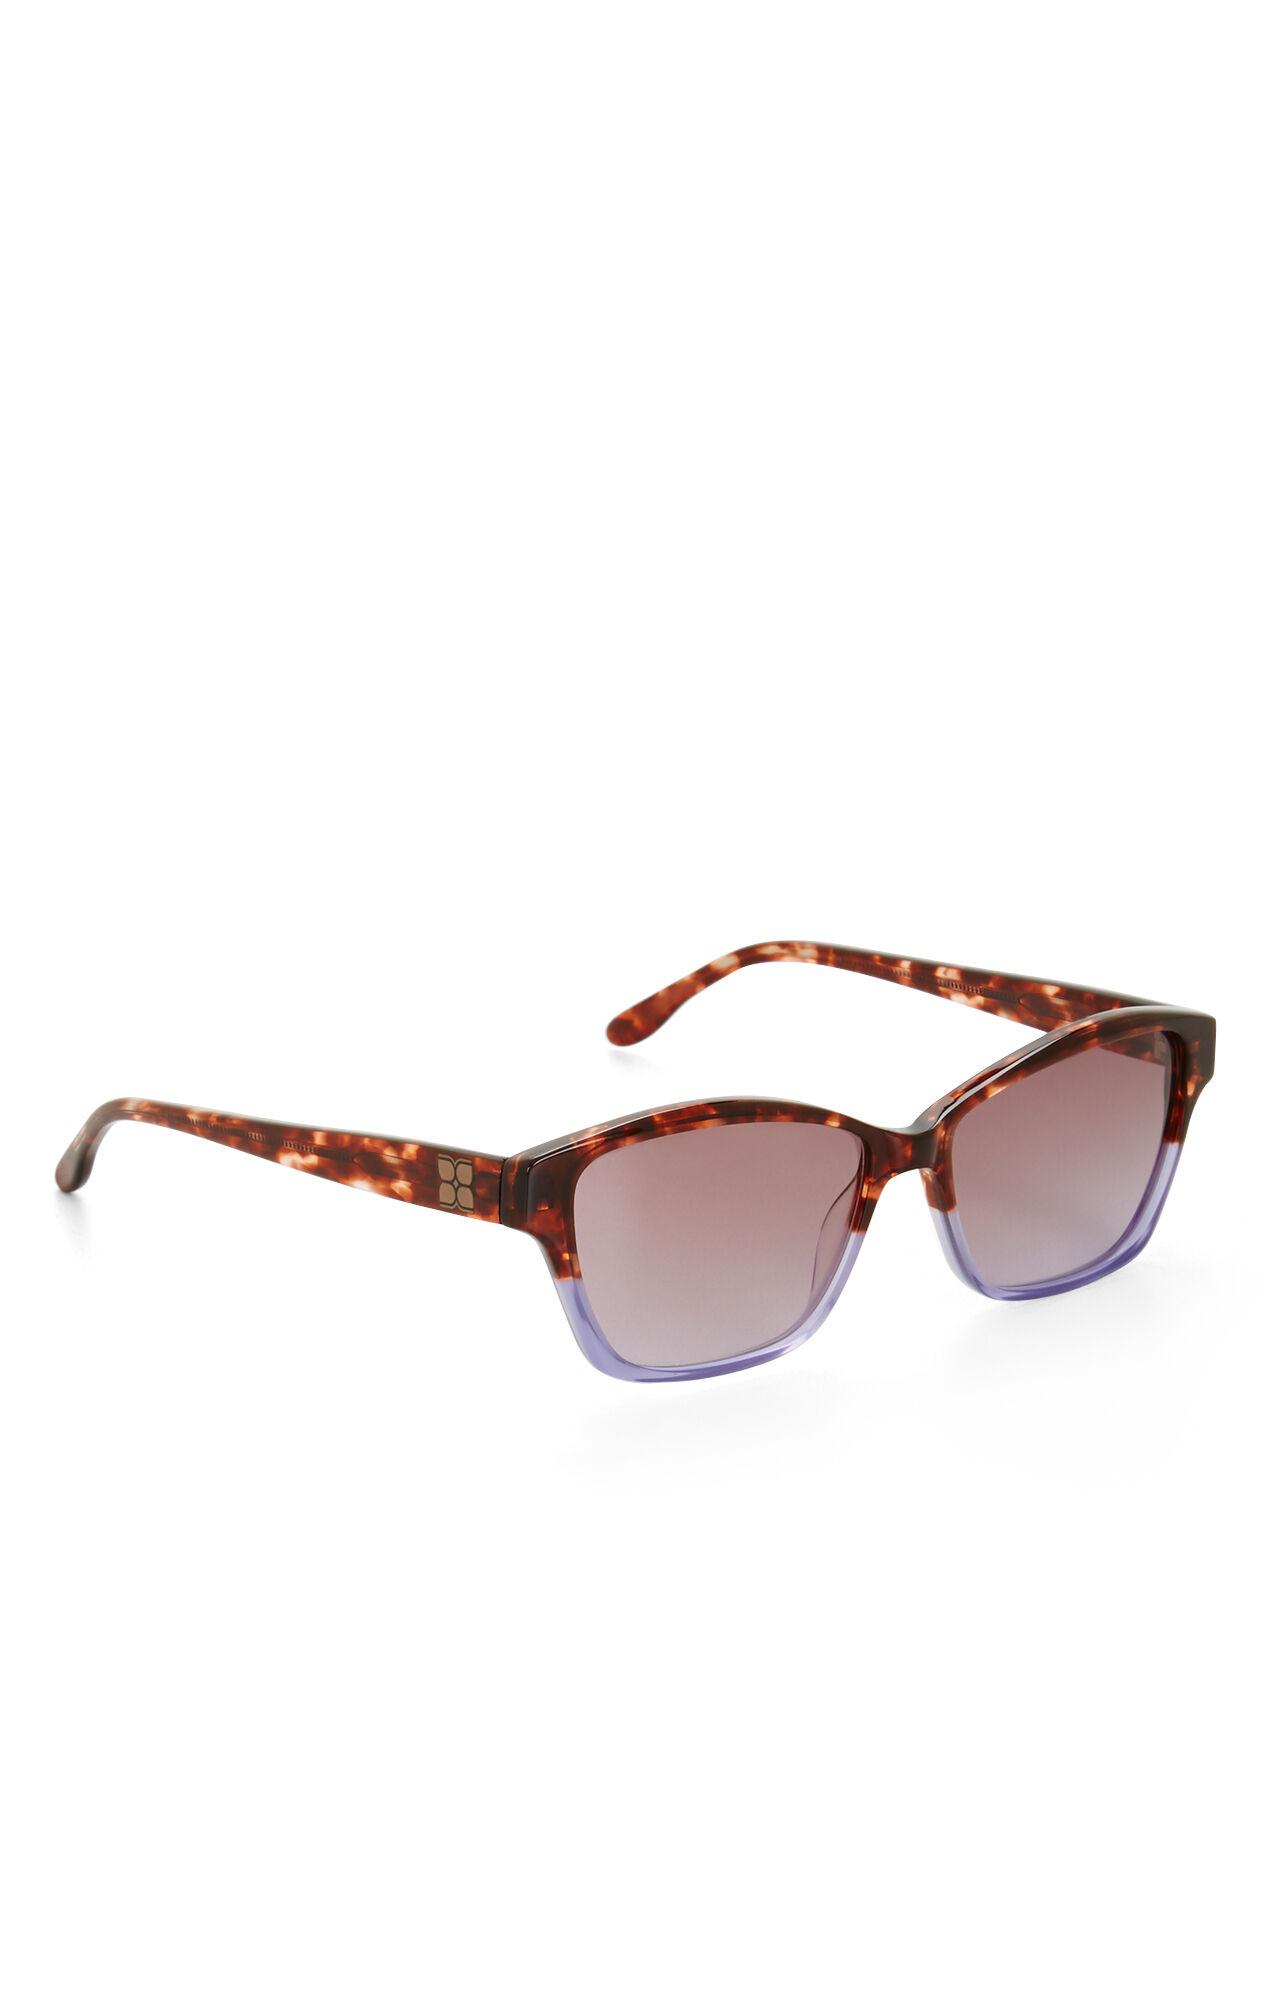 Spirited Sunglasses